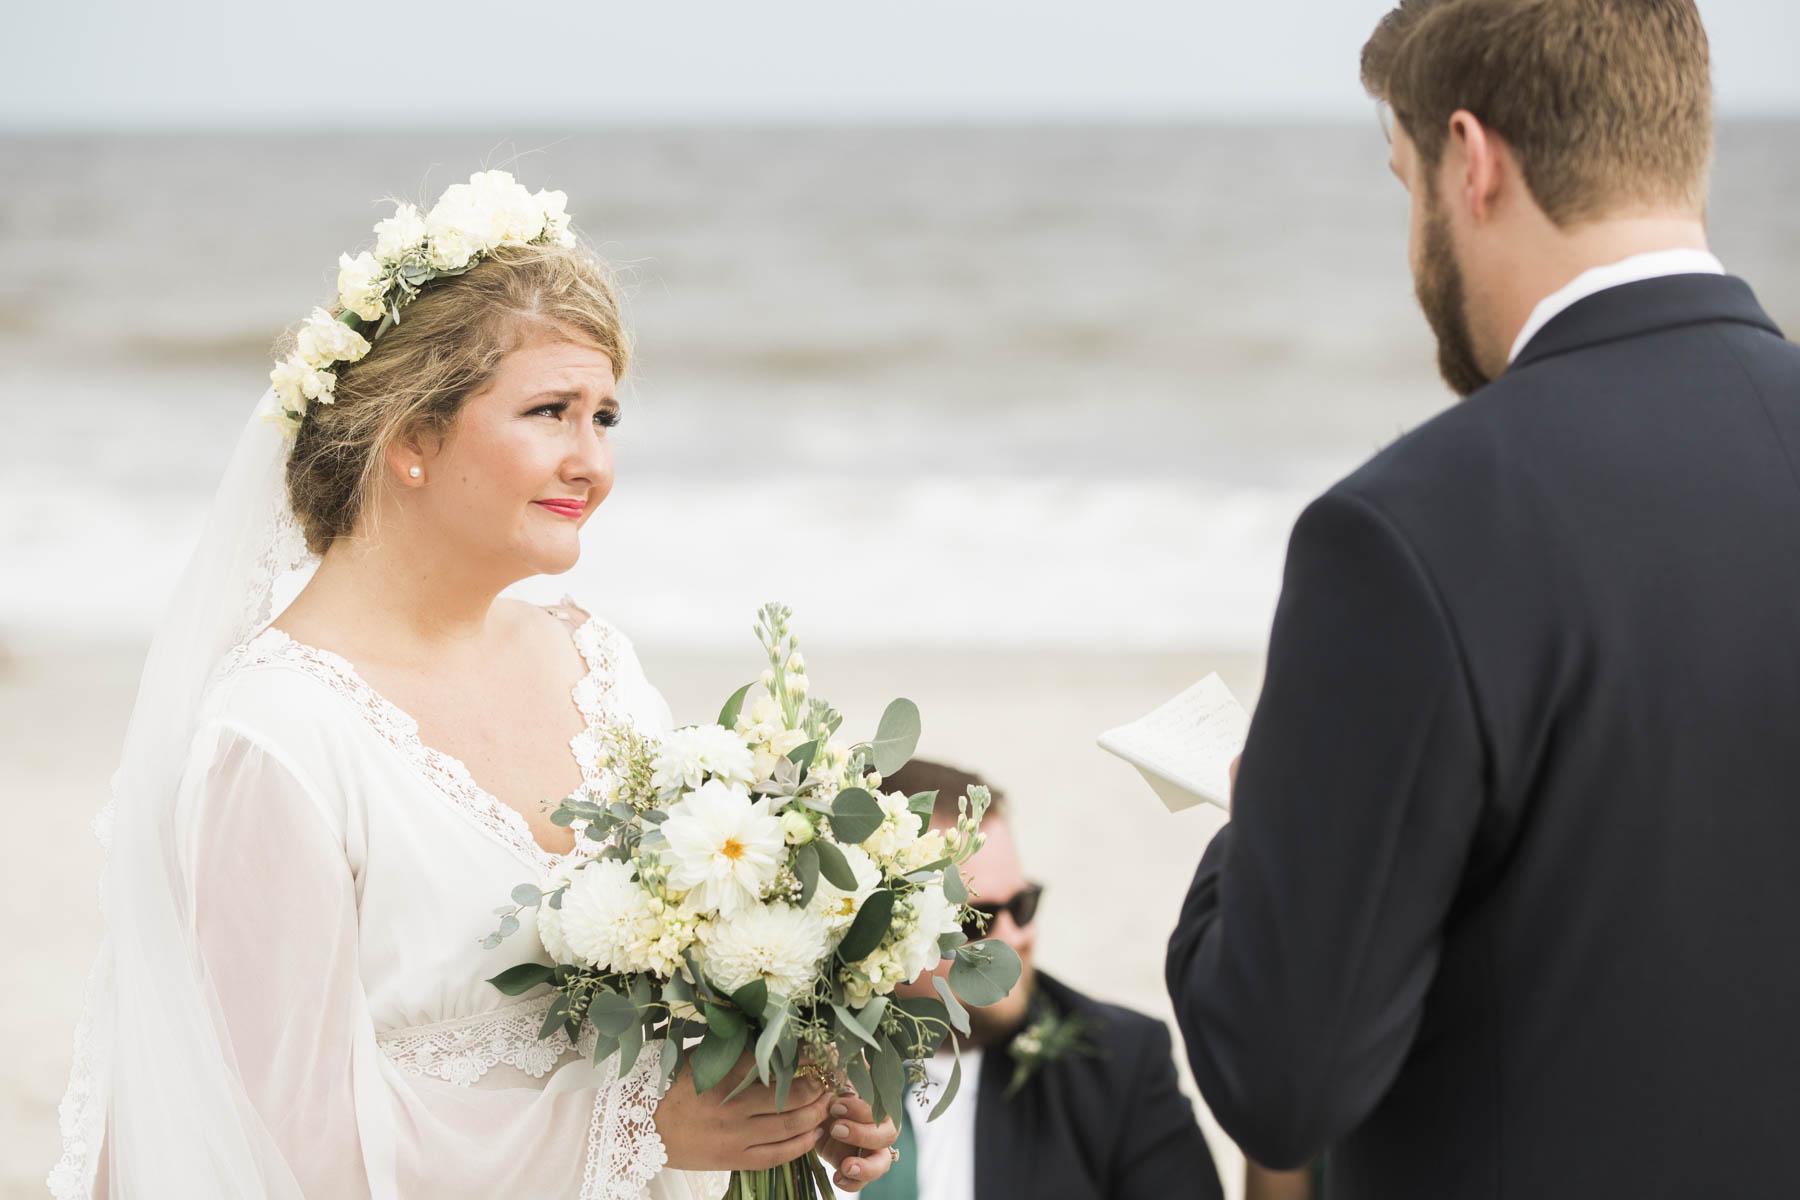 shotbychelsea_wedding_blog-29.jpg